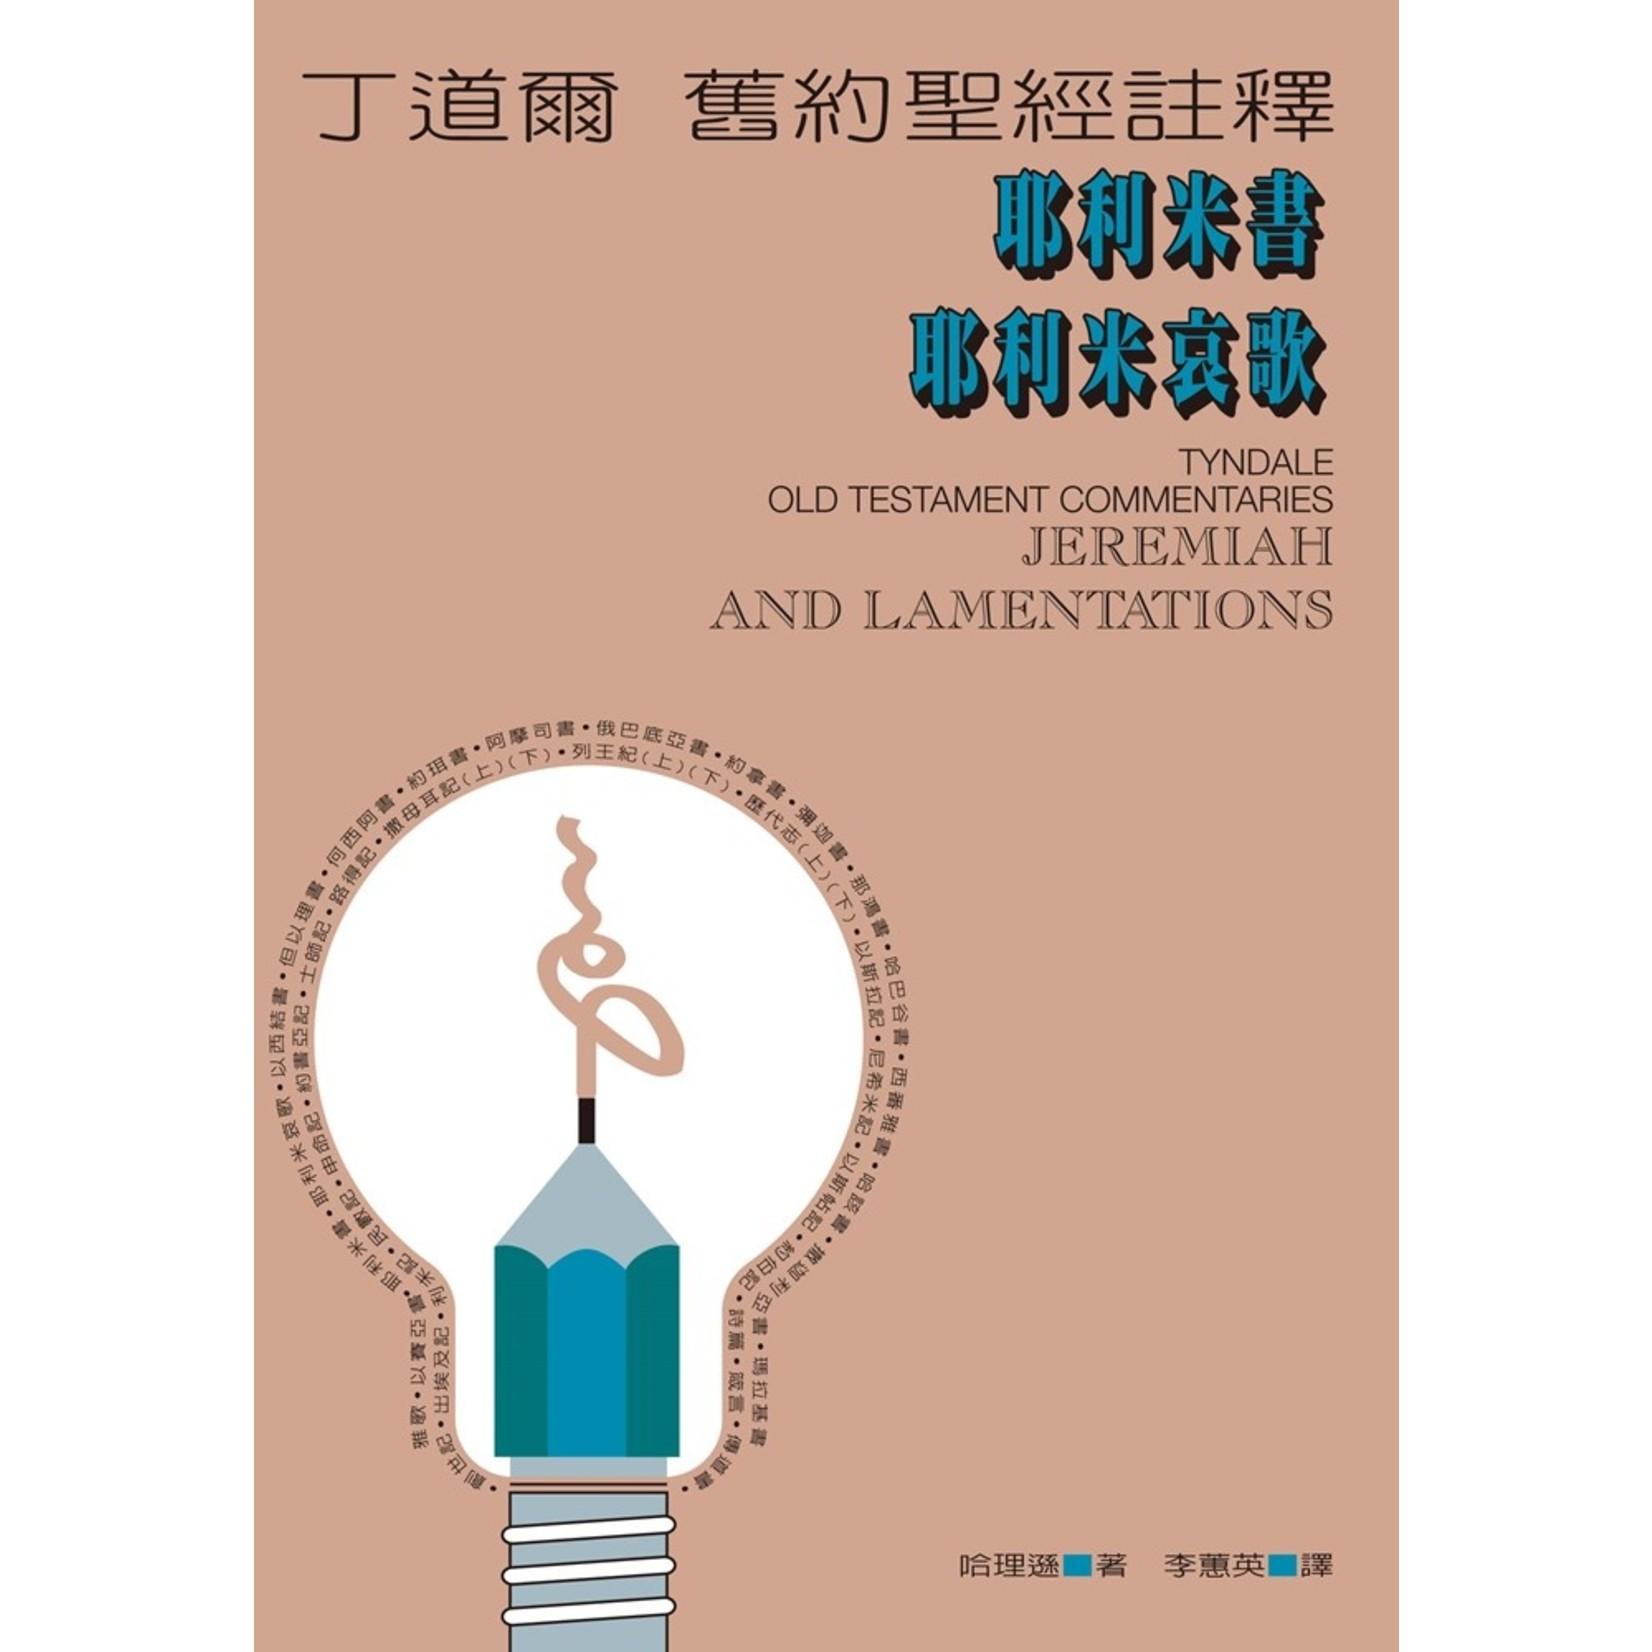 校園書房 Campus Books 丁道爾舊約聖經註釋:耶利米書 耶利米哀歌 Tyndale Old Testament Commentaries: Jeremiah and Lamentations